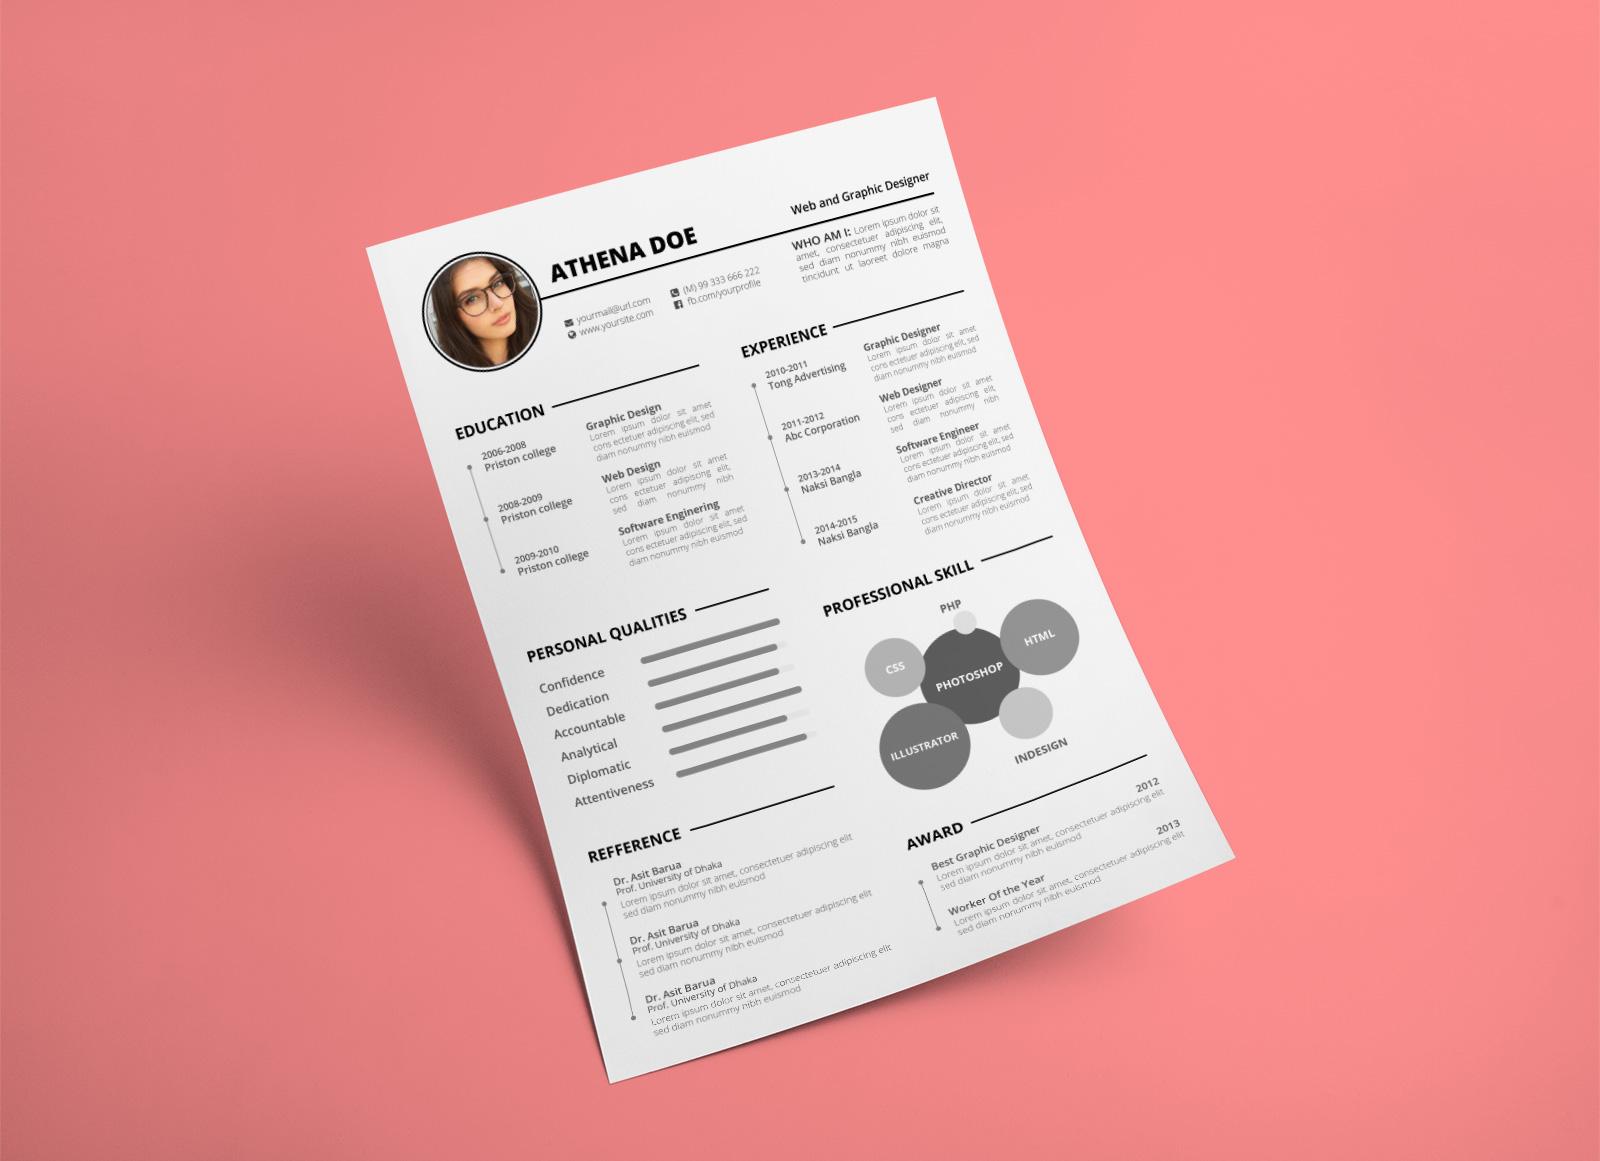 Free-Elegant-CV-Template-in-Word-PSD-&-Ai-Format-1 (1)